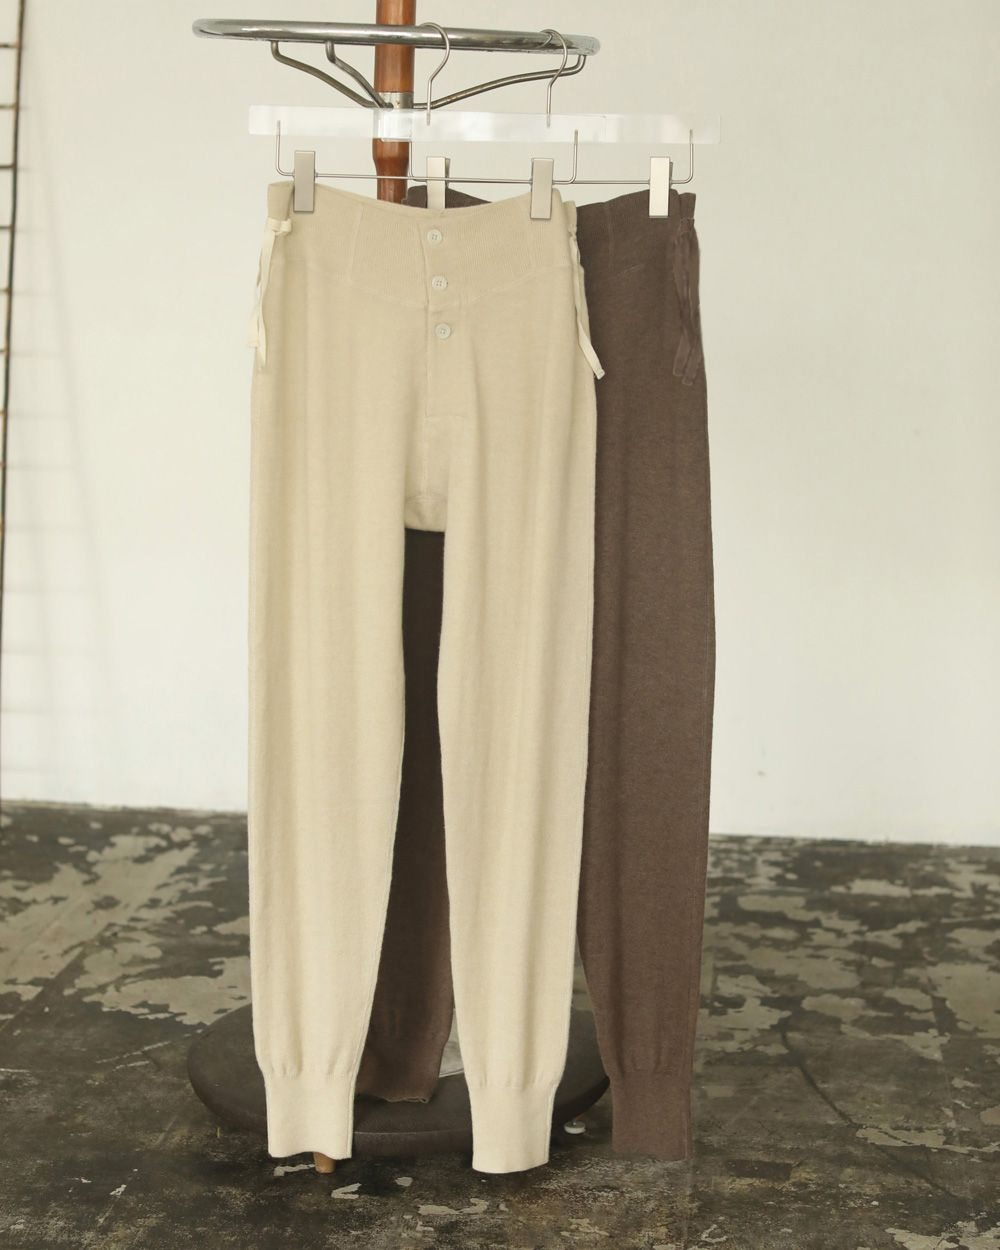 Vintage Knit Pants